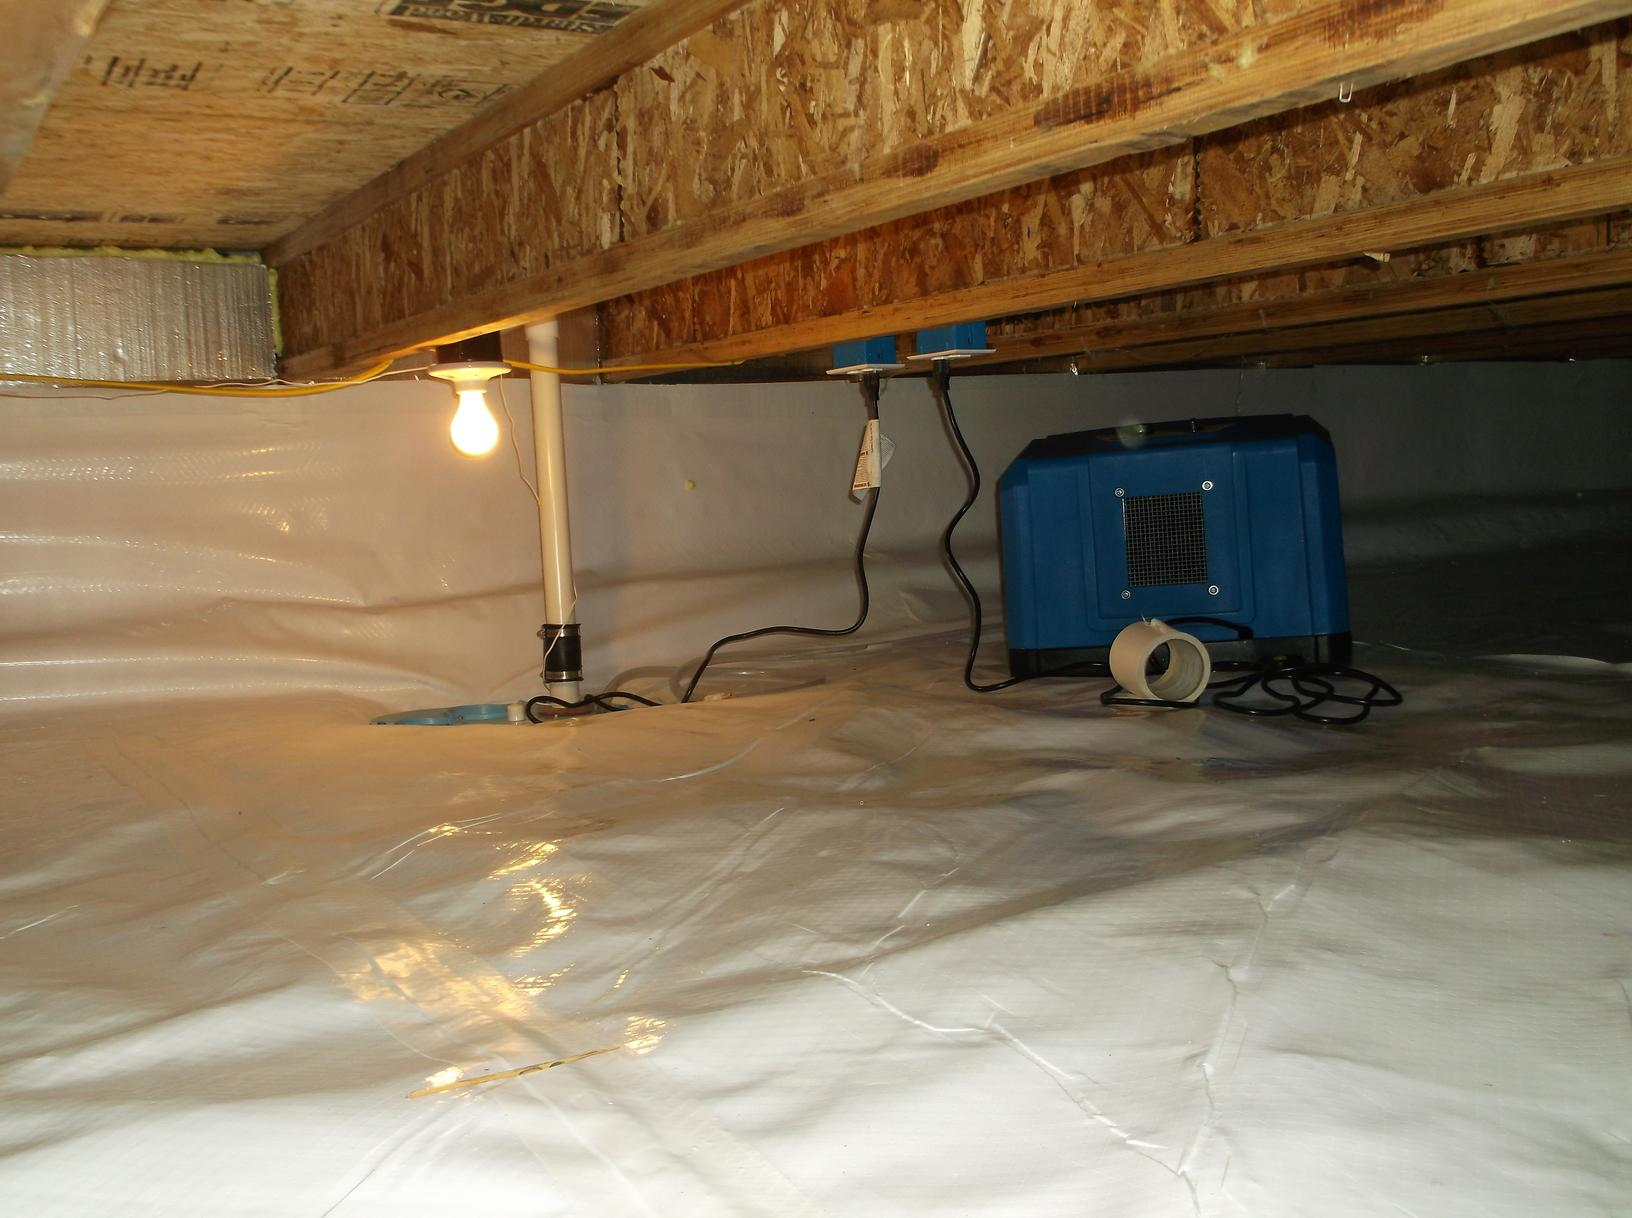 Sump pump and dehumidifier